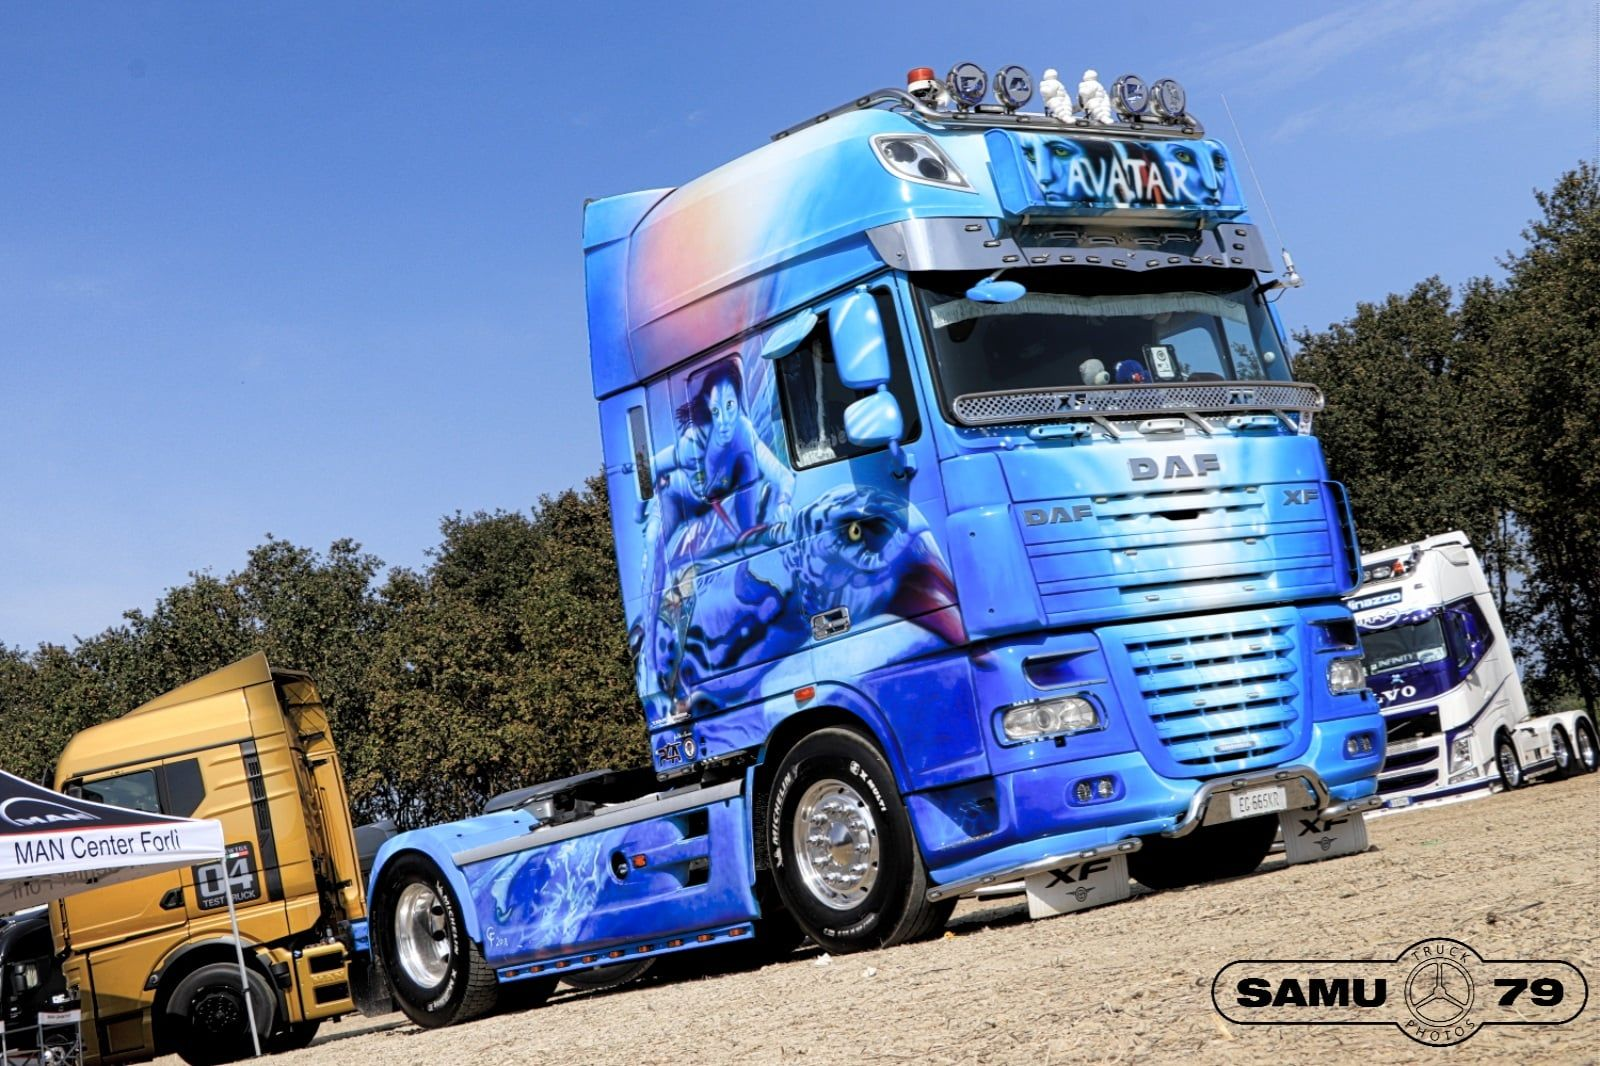 Pin By Piotrek On Tunnig Truck In 2020 Trucks Vehicles